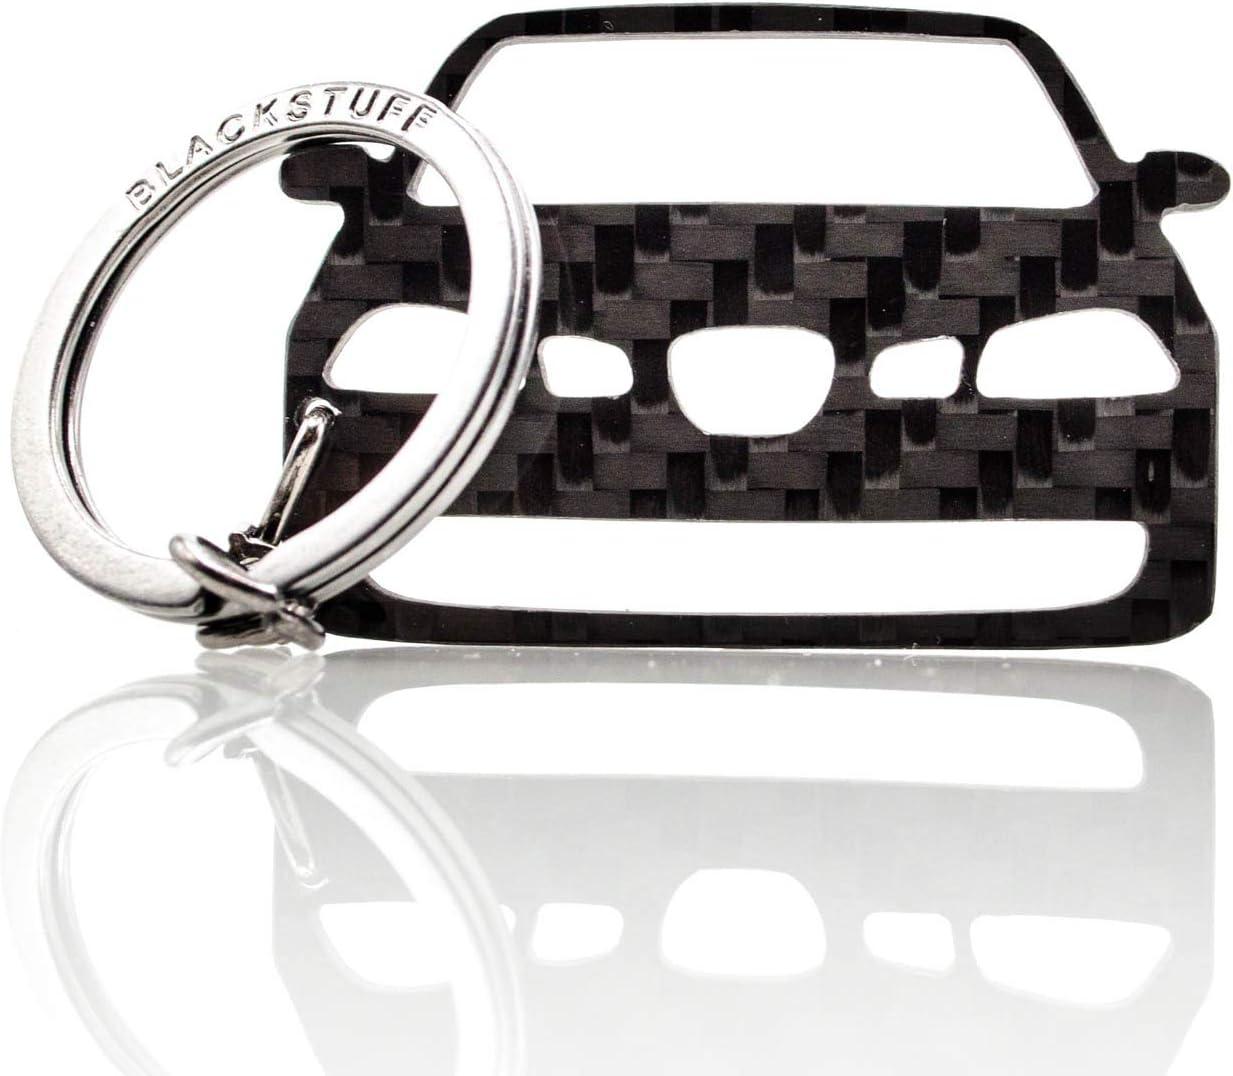 BlackStuff Carbon Fiber Keychain Keyring Ring Holder Compatible with Ibiza MK3 6L FR Cupra 2002-2008 BS-833